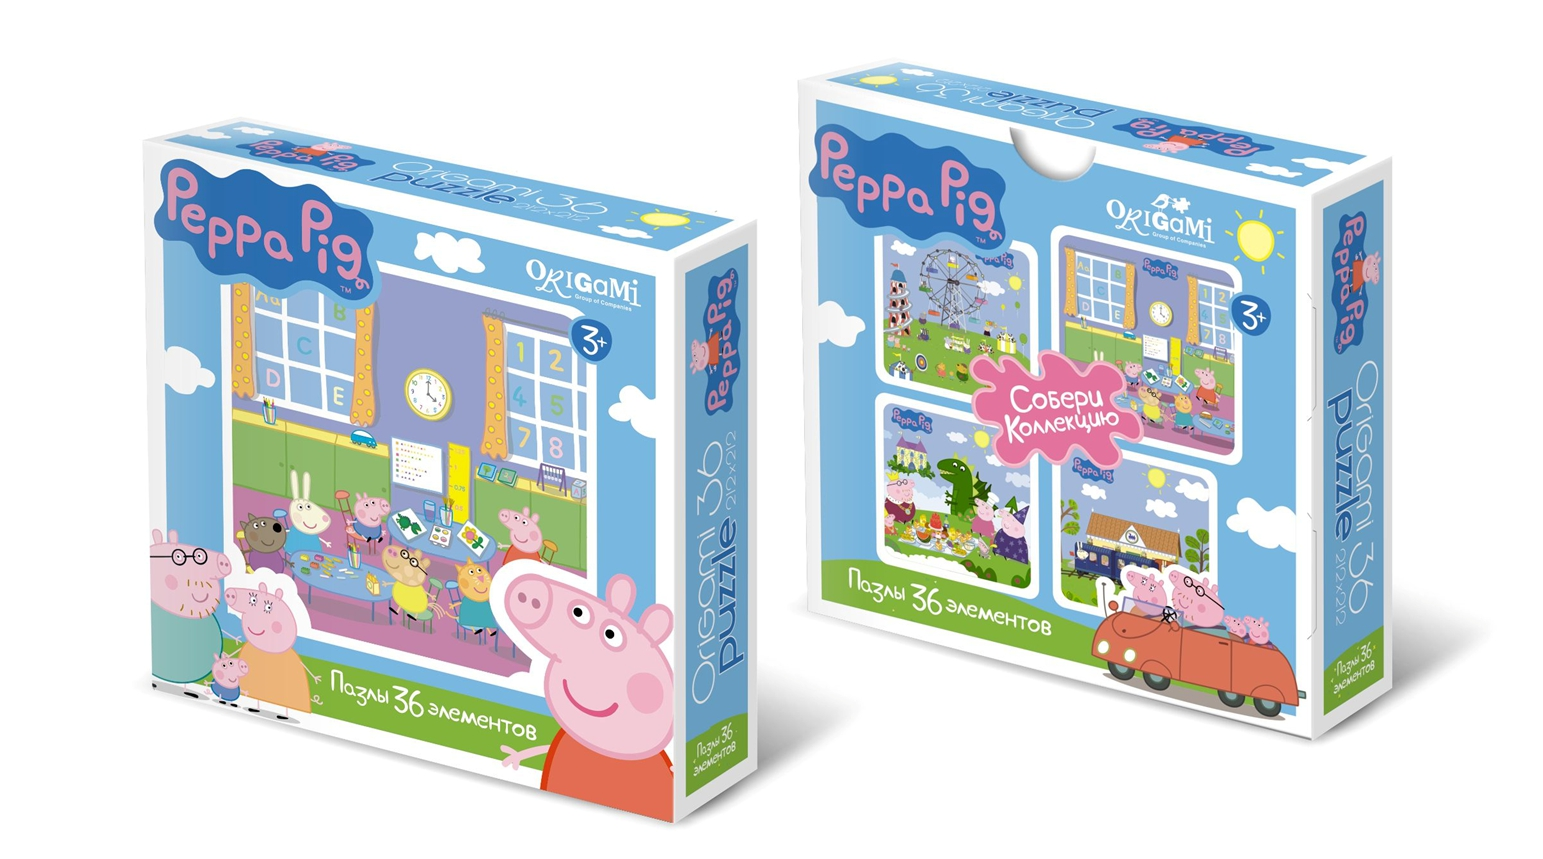 Пазлы Peppa Pig Детский сад